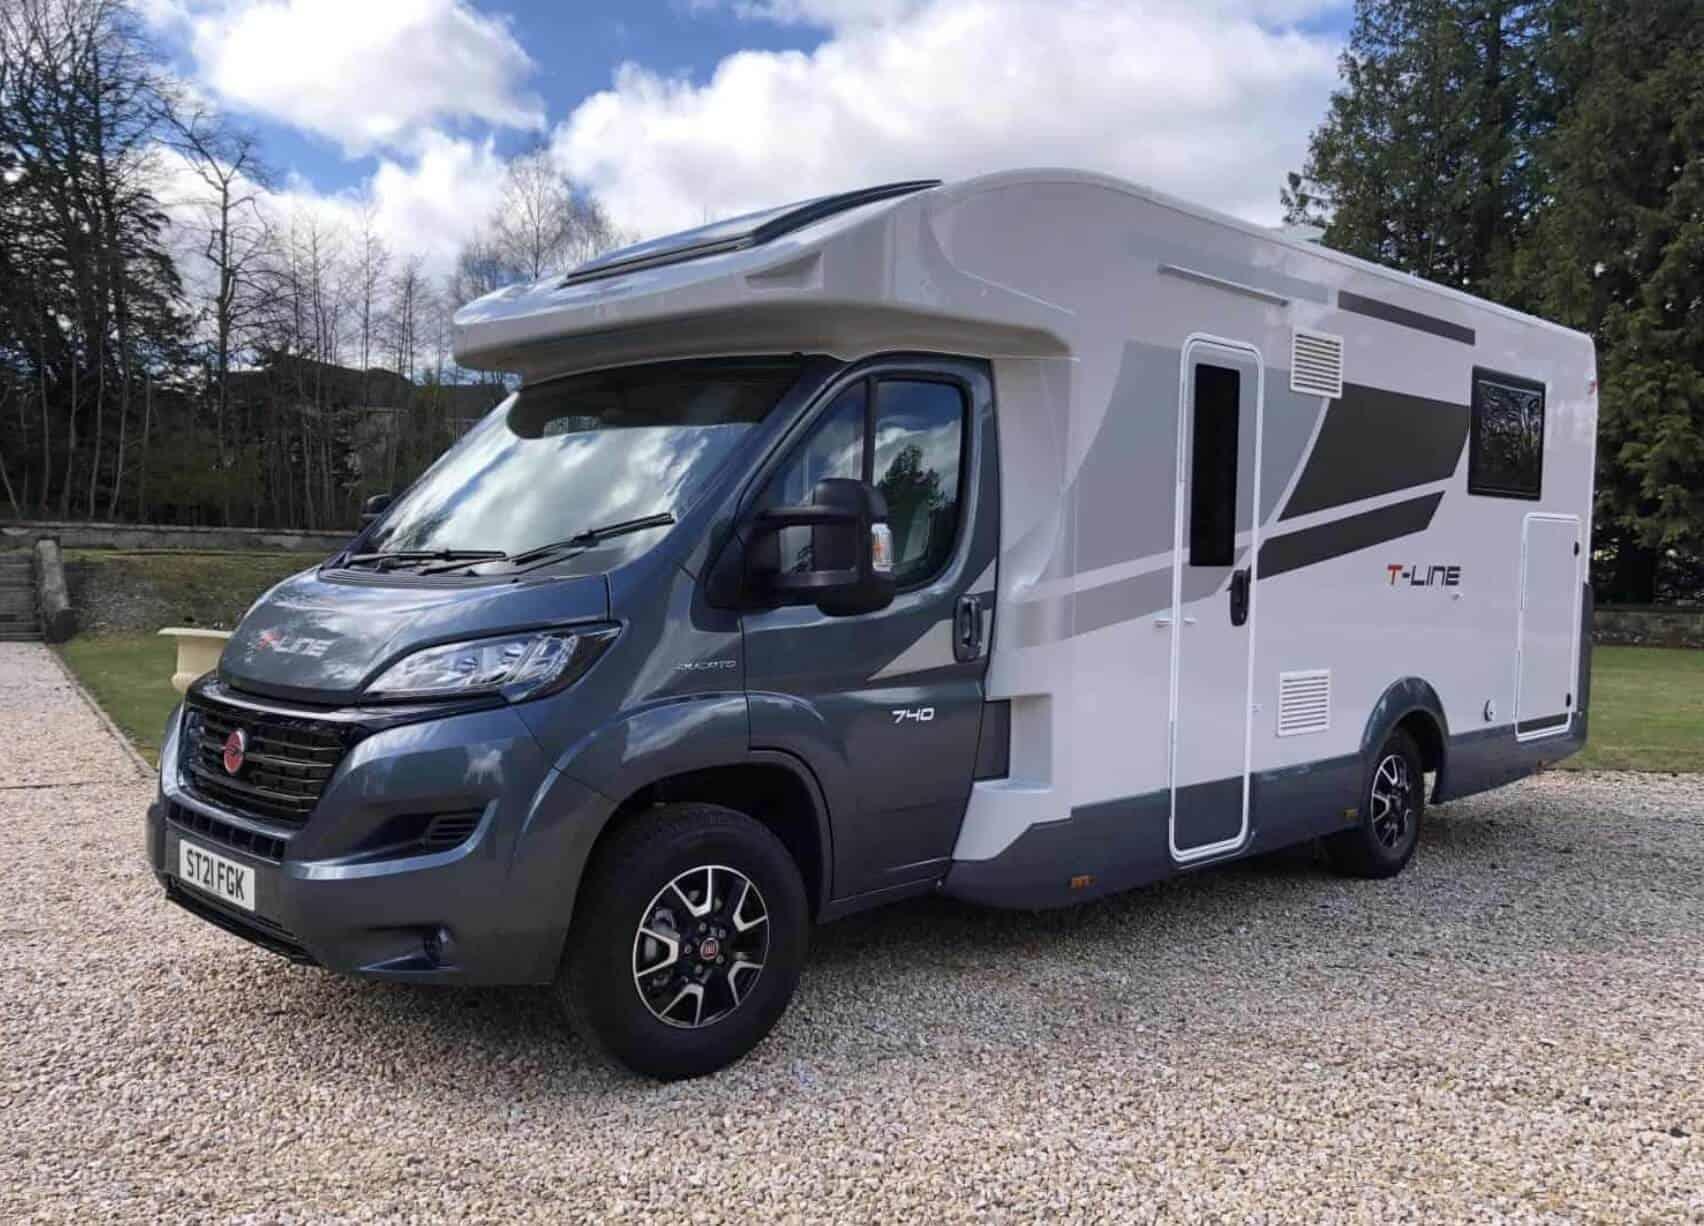 campervan-hire-scotland-hotel-on wheels